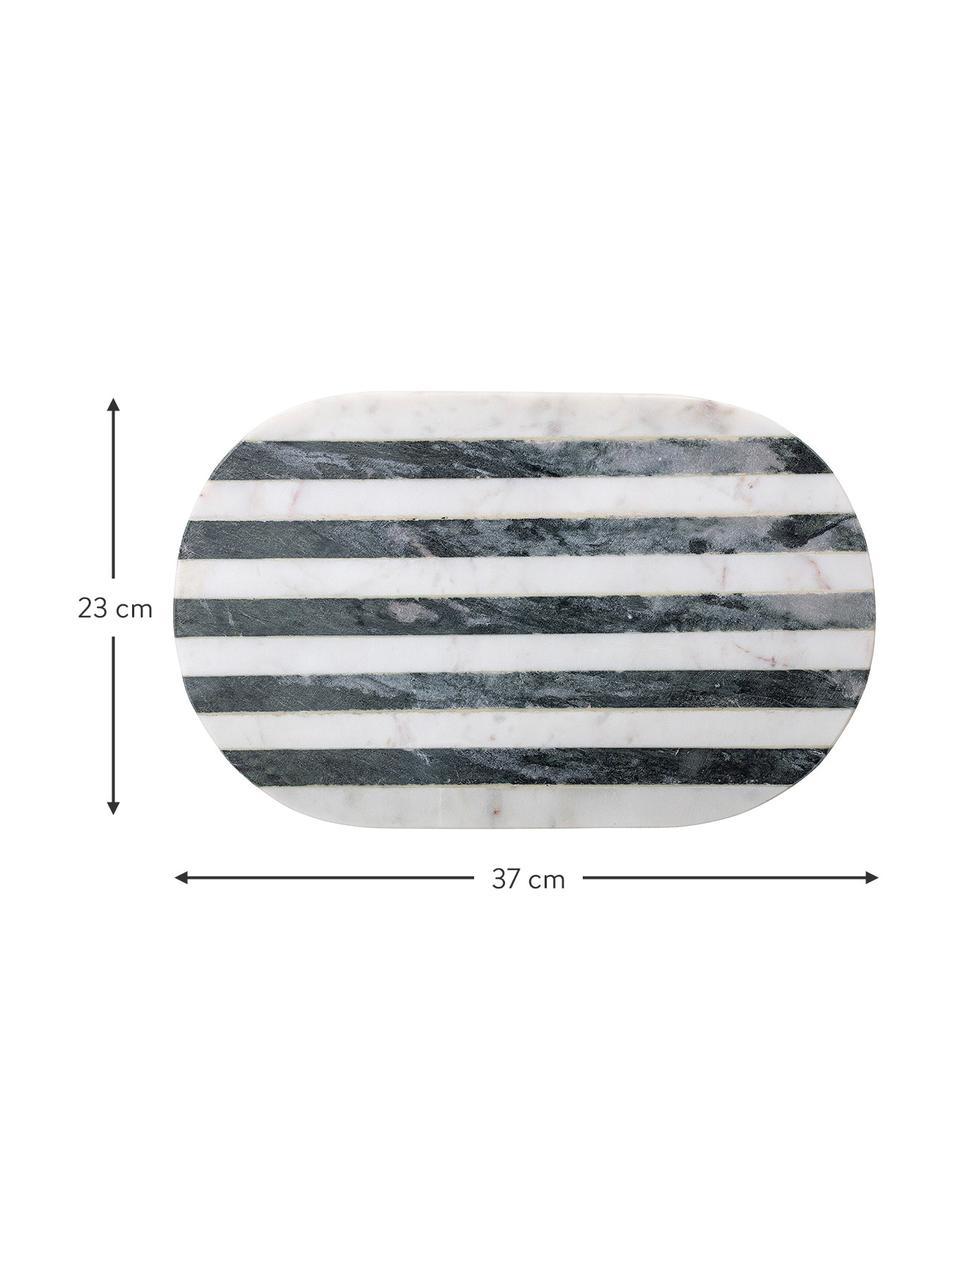 Marmor-Schneidebrett Stripes, L 37 x B 23 cm, Marmor, Schwarz, Weiß, 23 x 37 cm